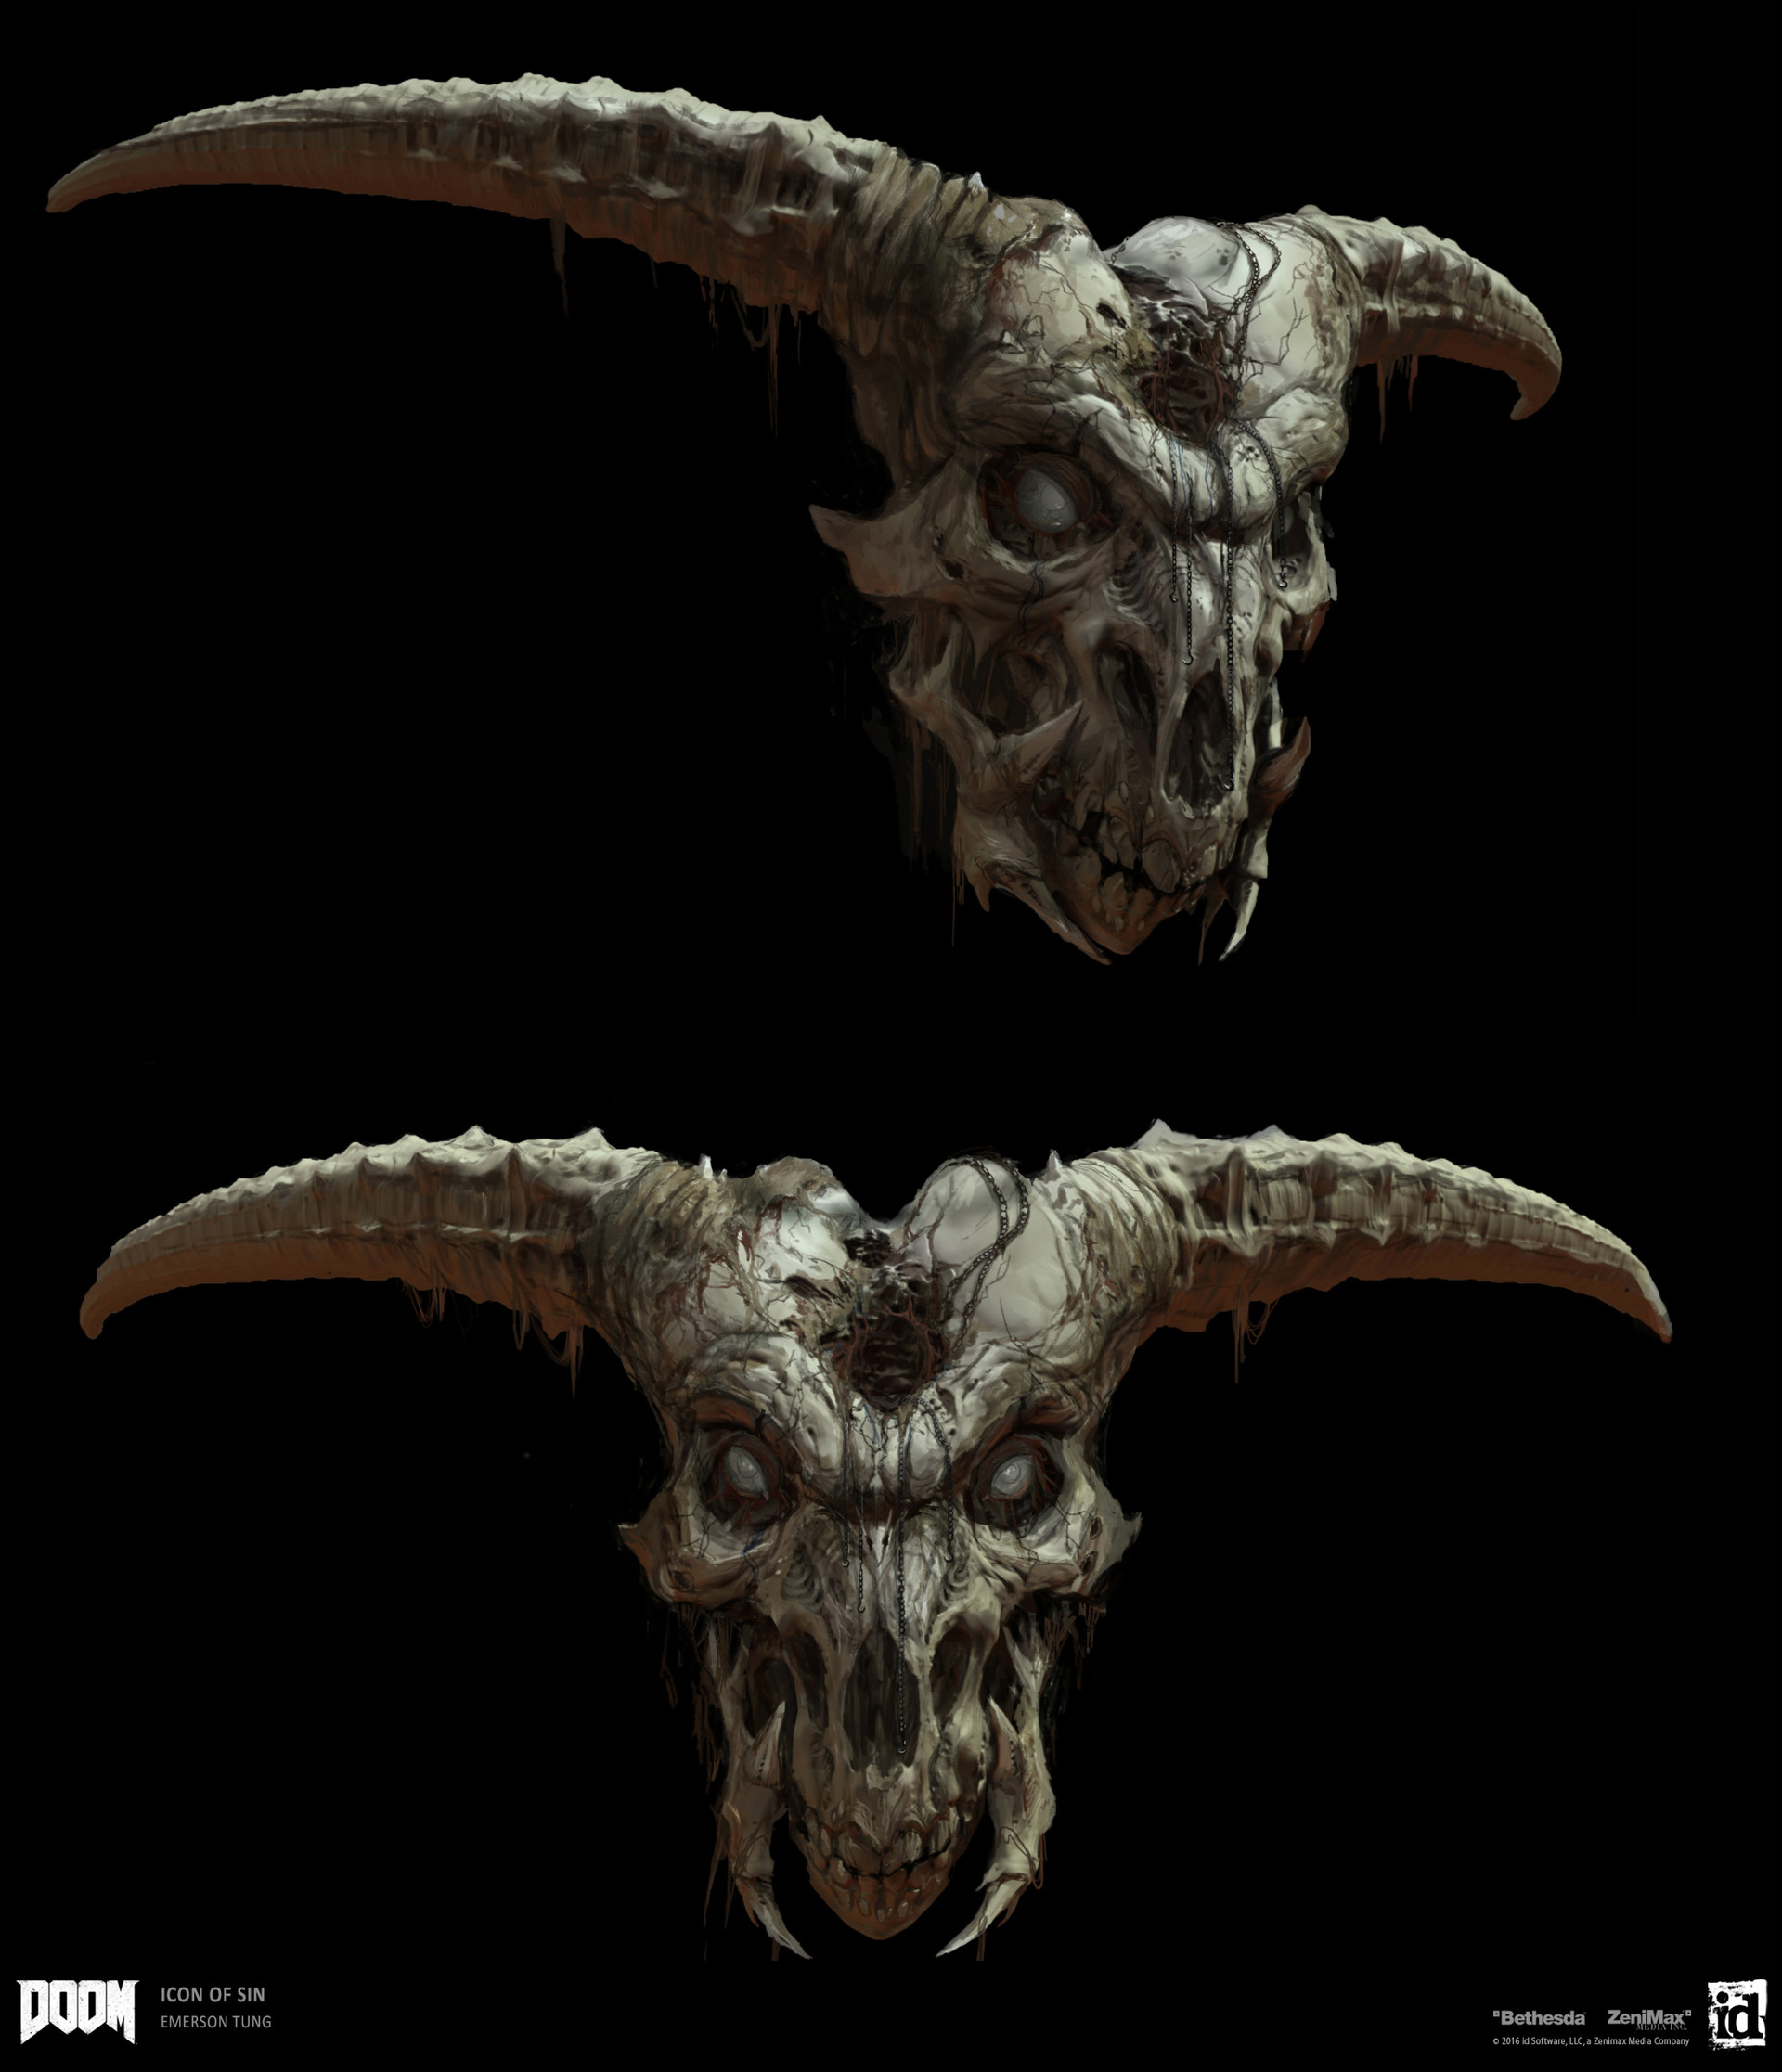 Doom Concept Art By Emerson Tung Concept Art World